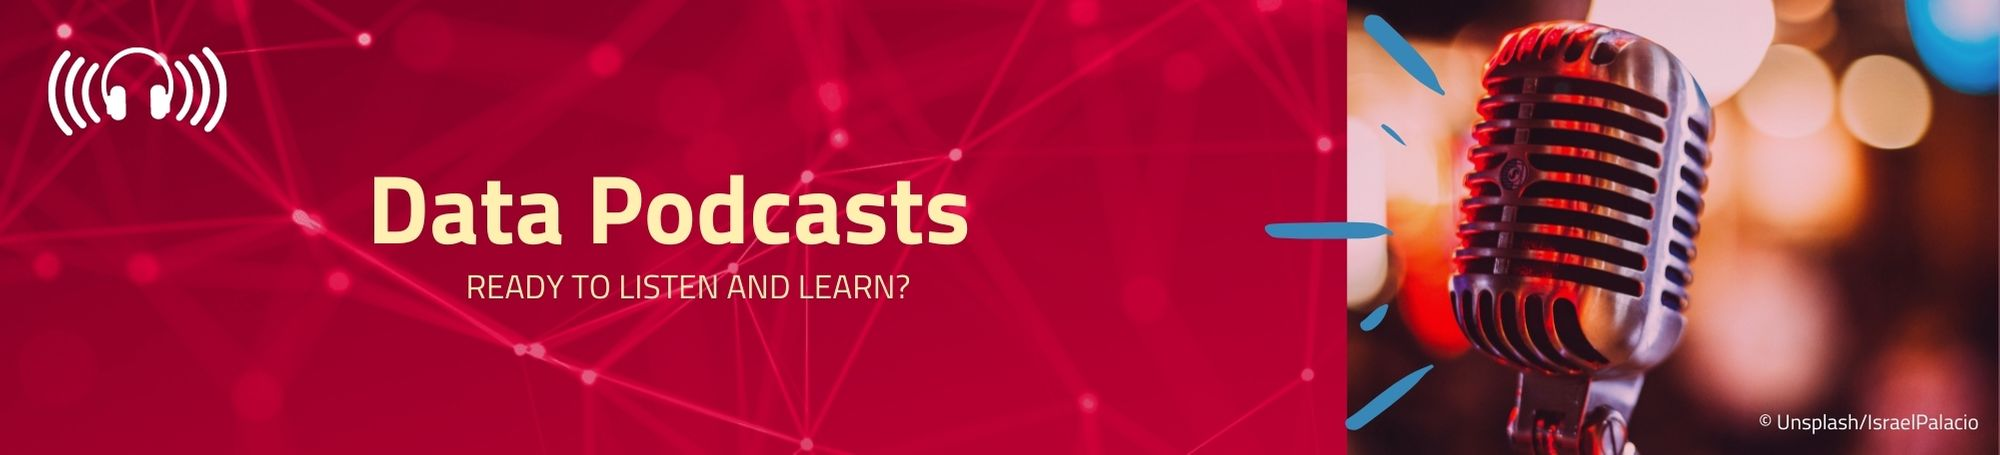 Websitenbanner Podcasts